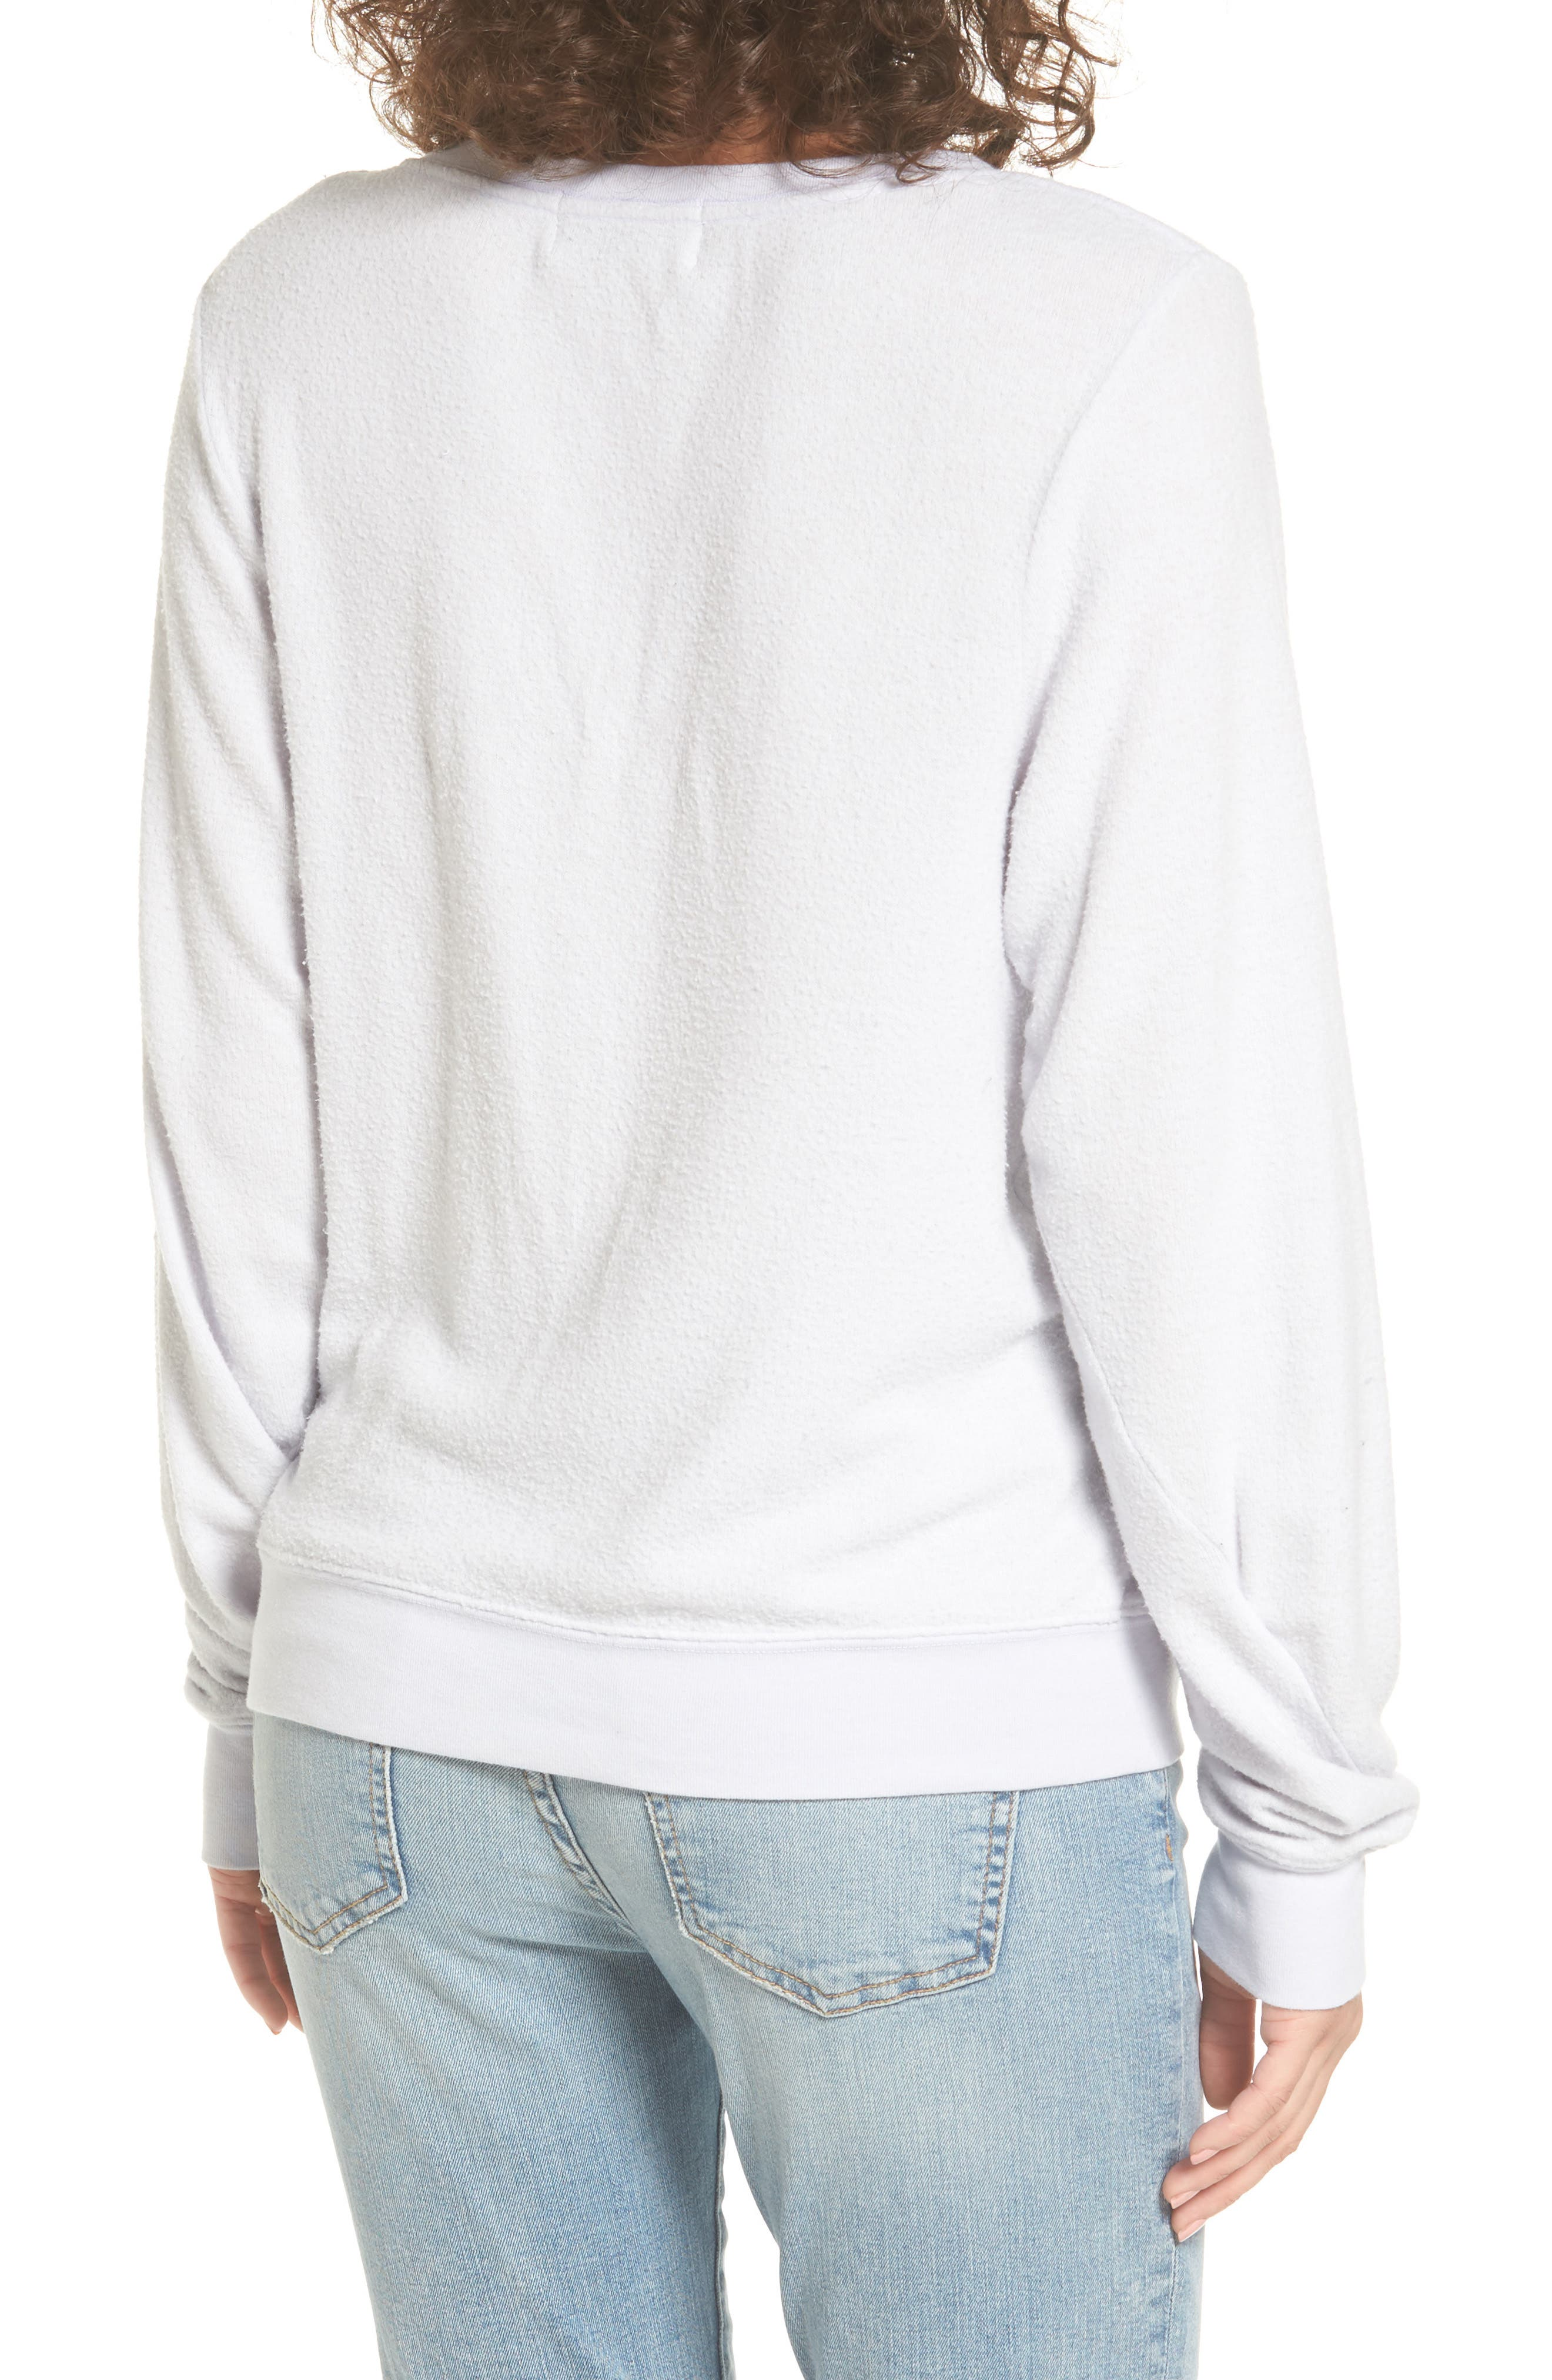 Sunday Sweatshirt,                             Alternate thumbnail 2, color,                             450